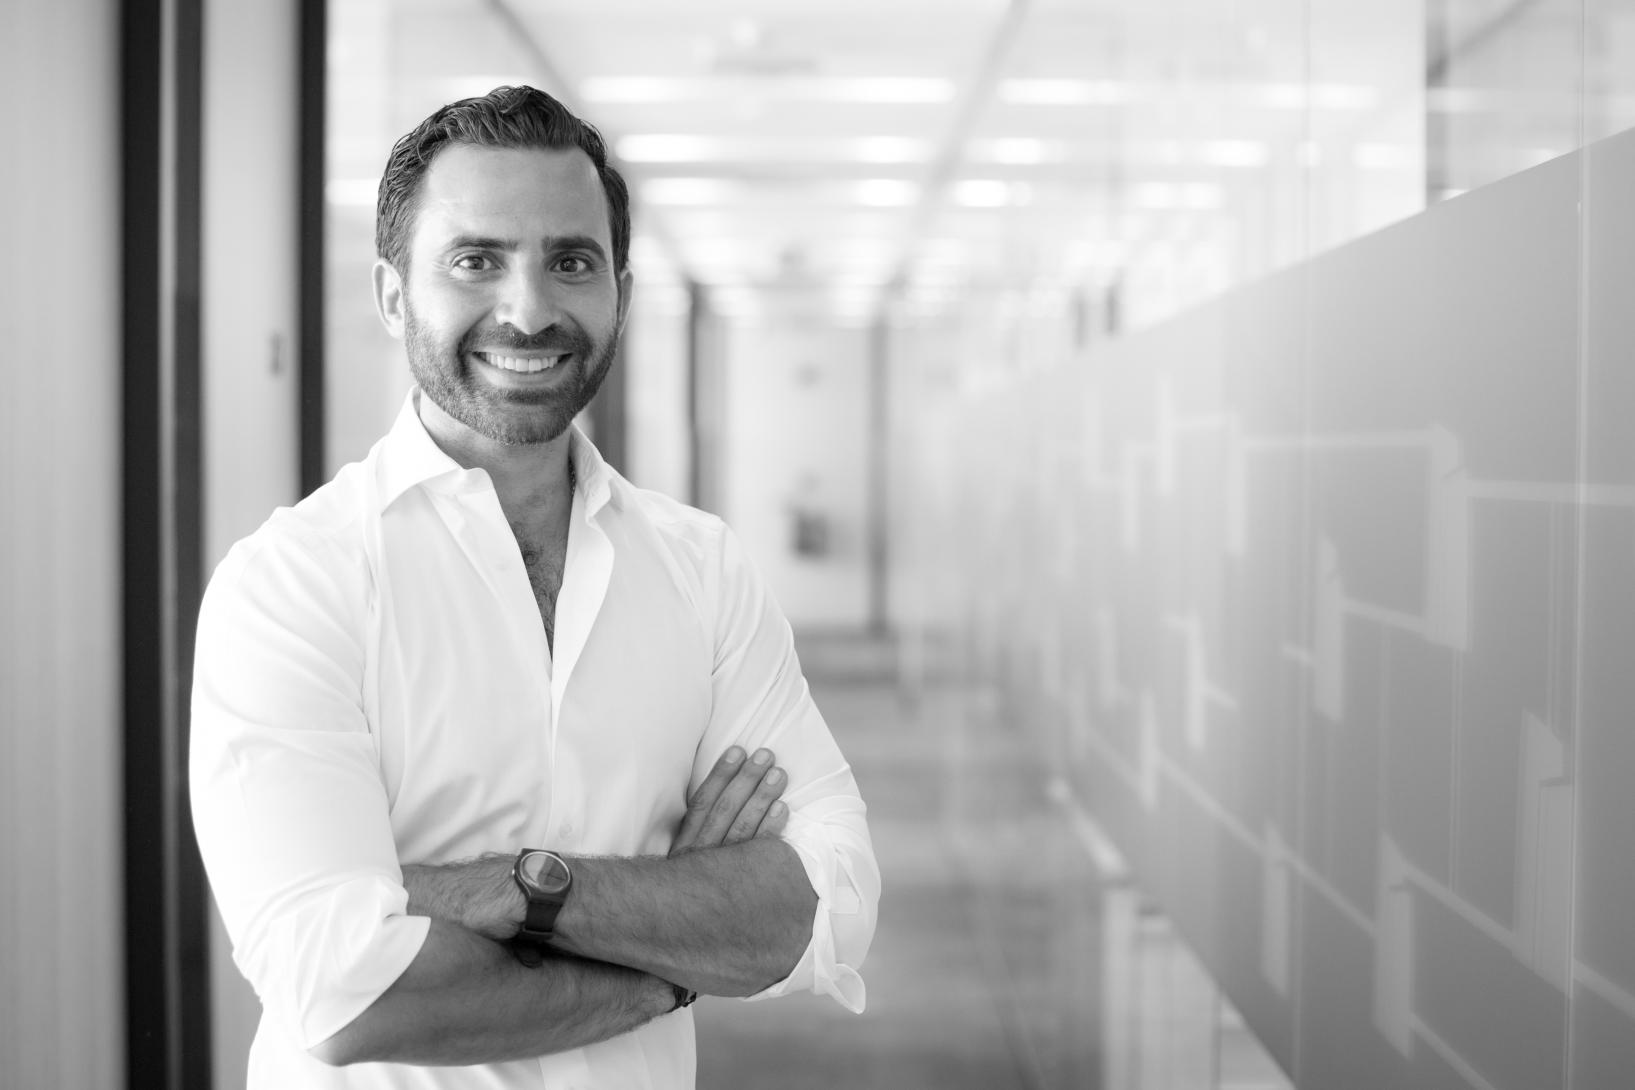 Startup Data Platform MAGNiTT.com Raises $1 Million In Seed Round